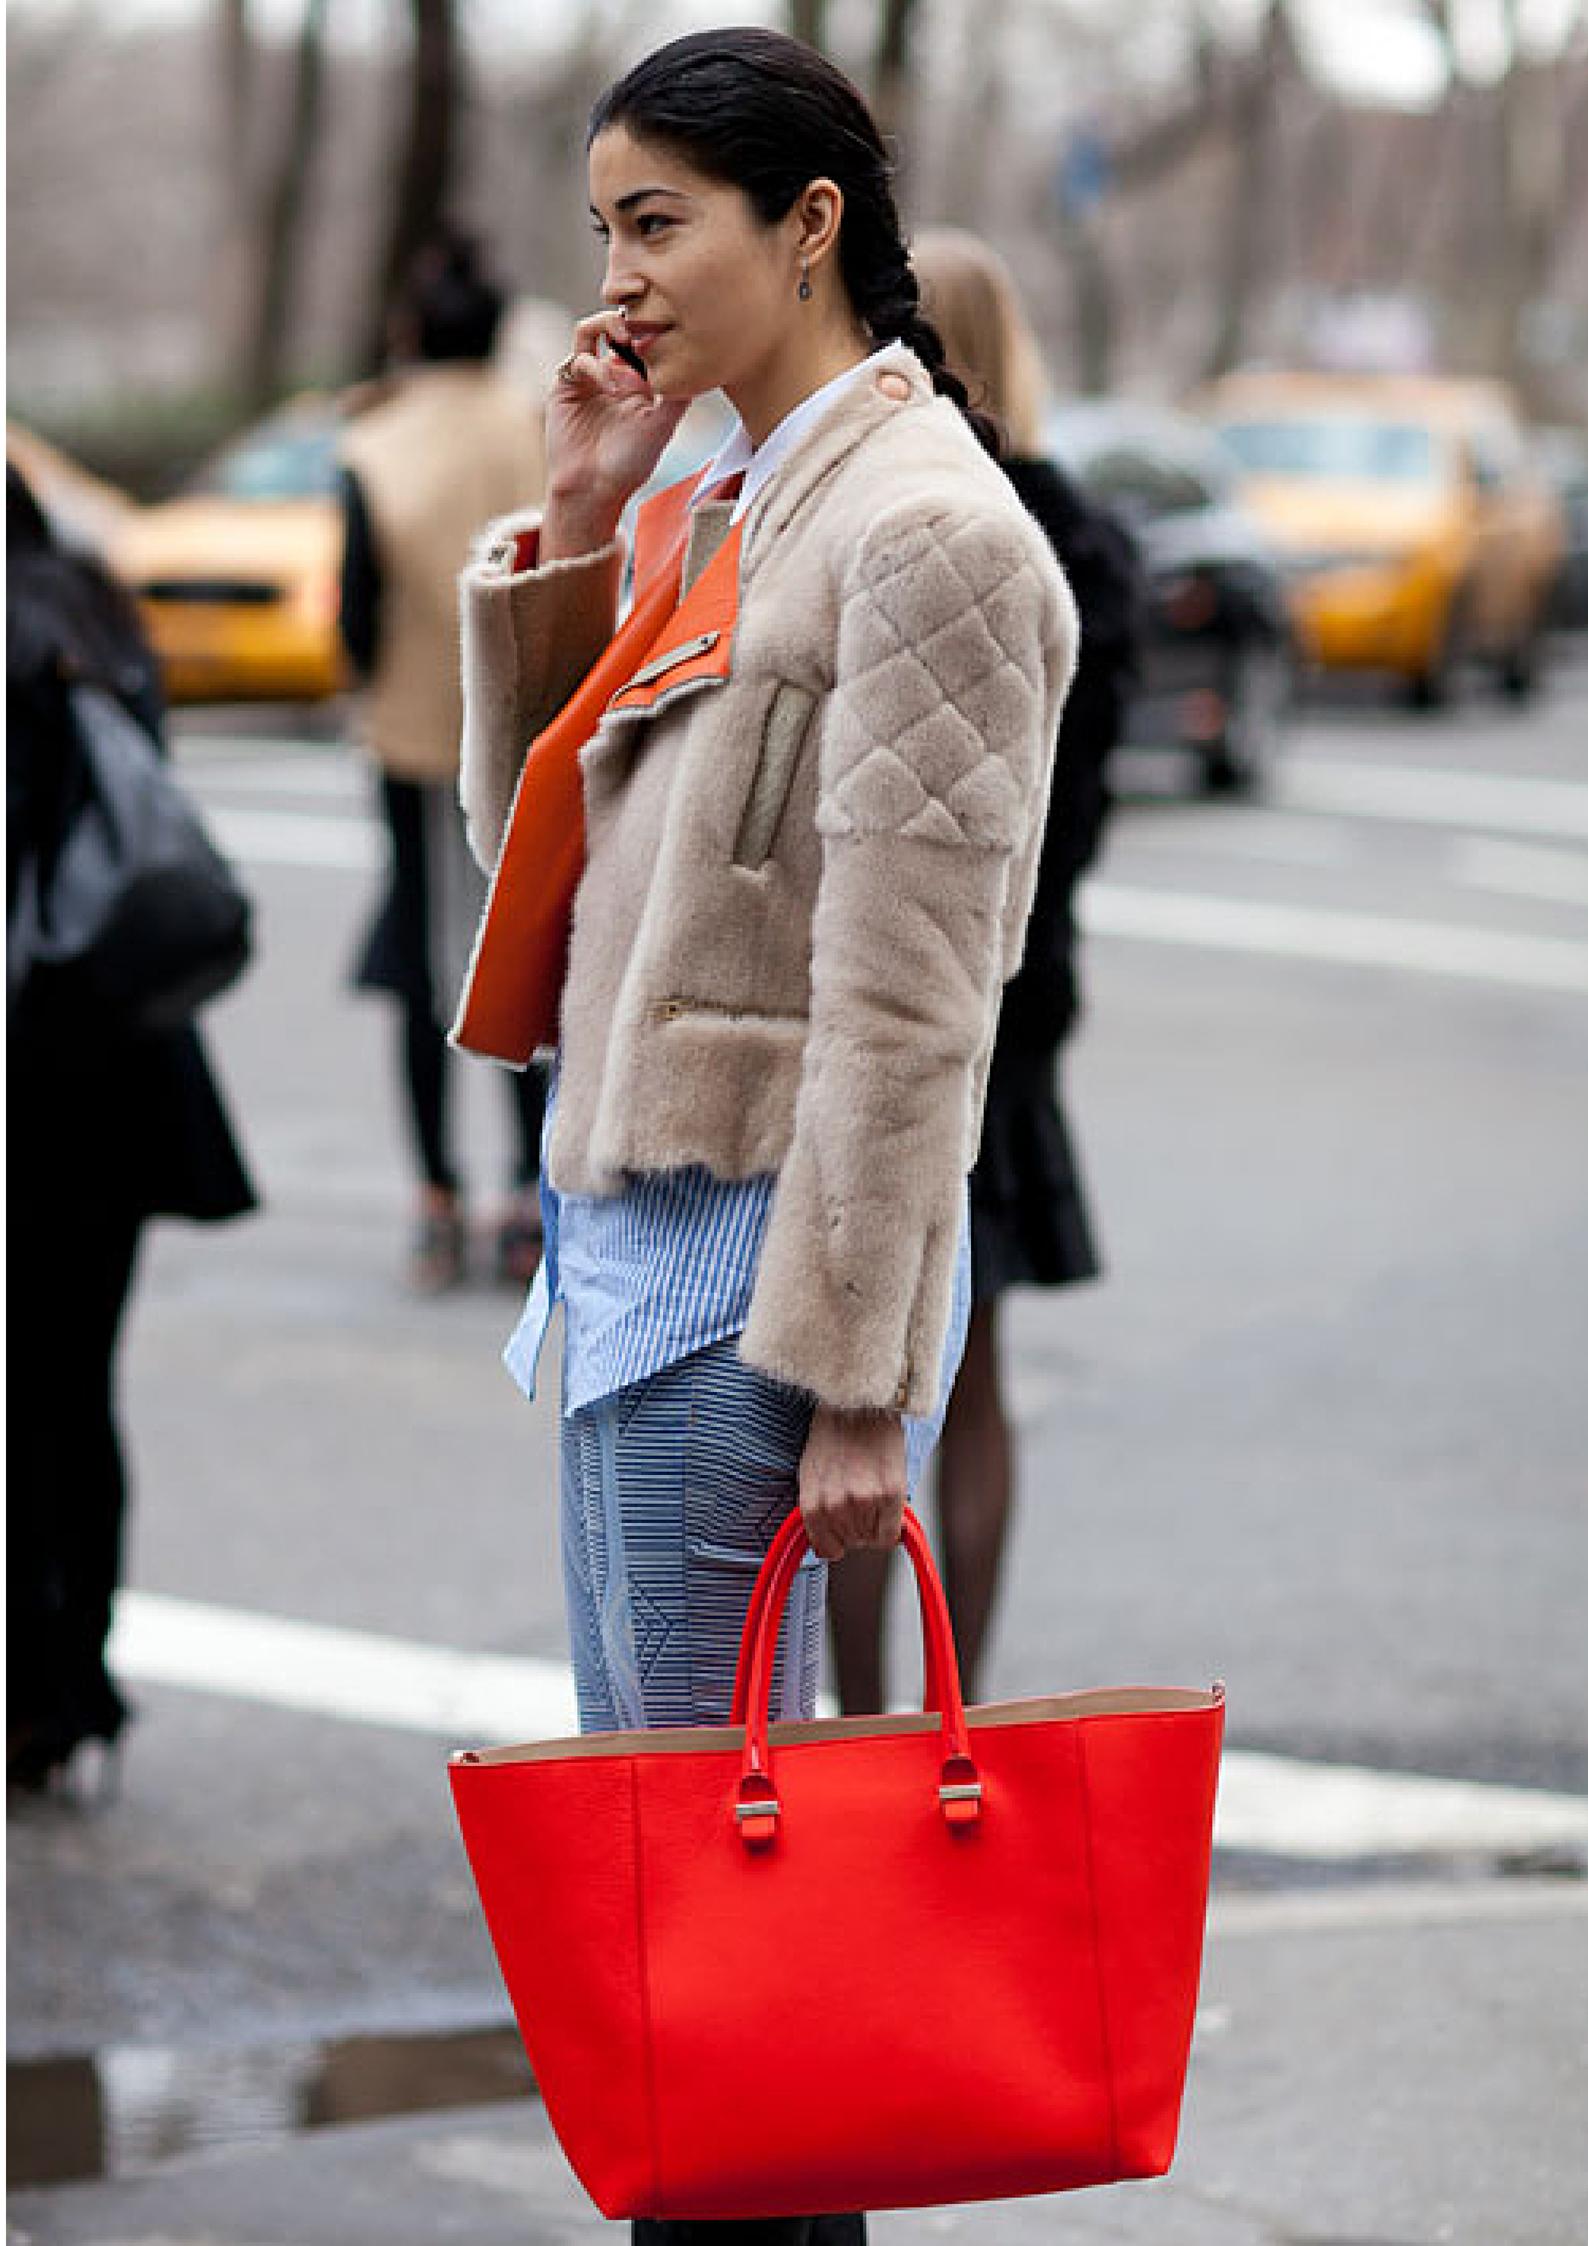 foto: street style/ reprodução